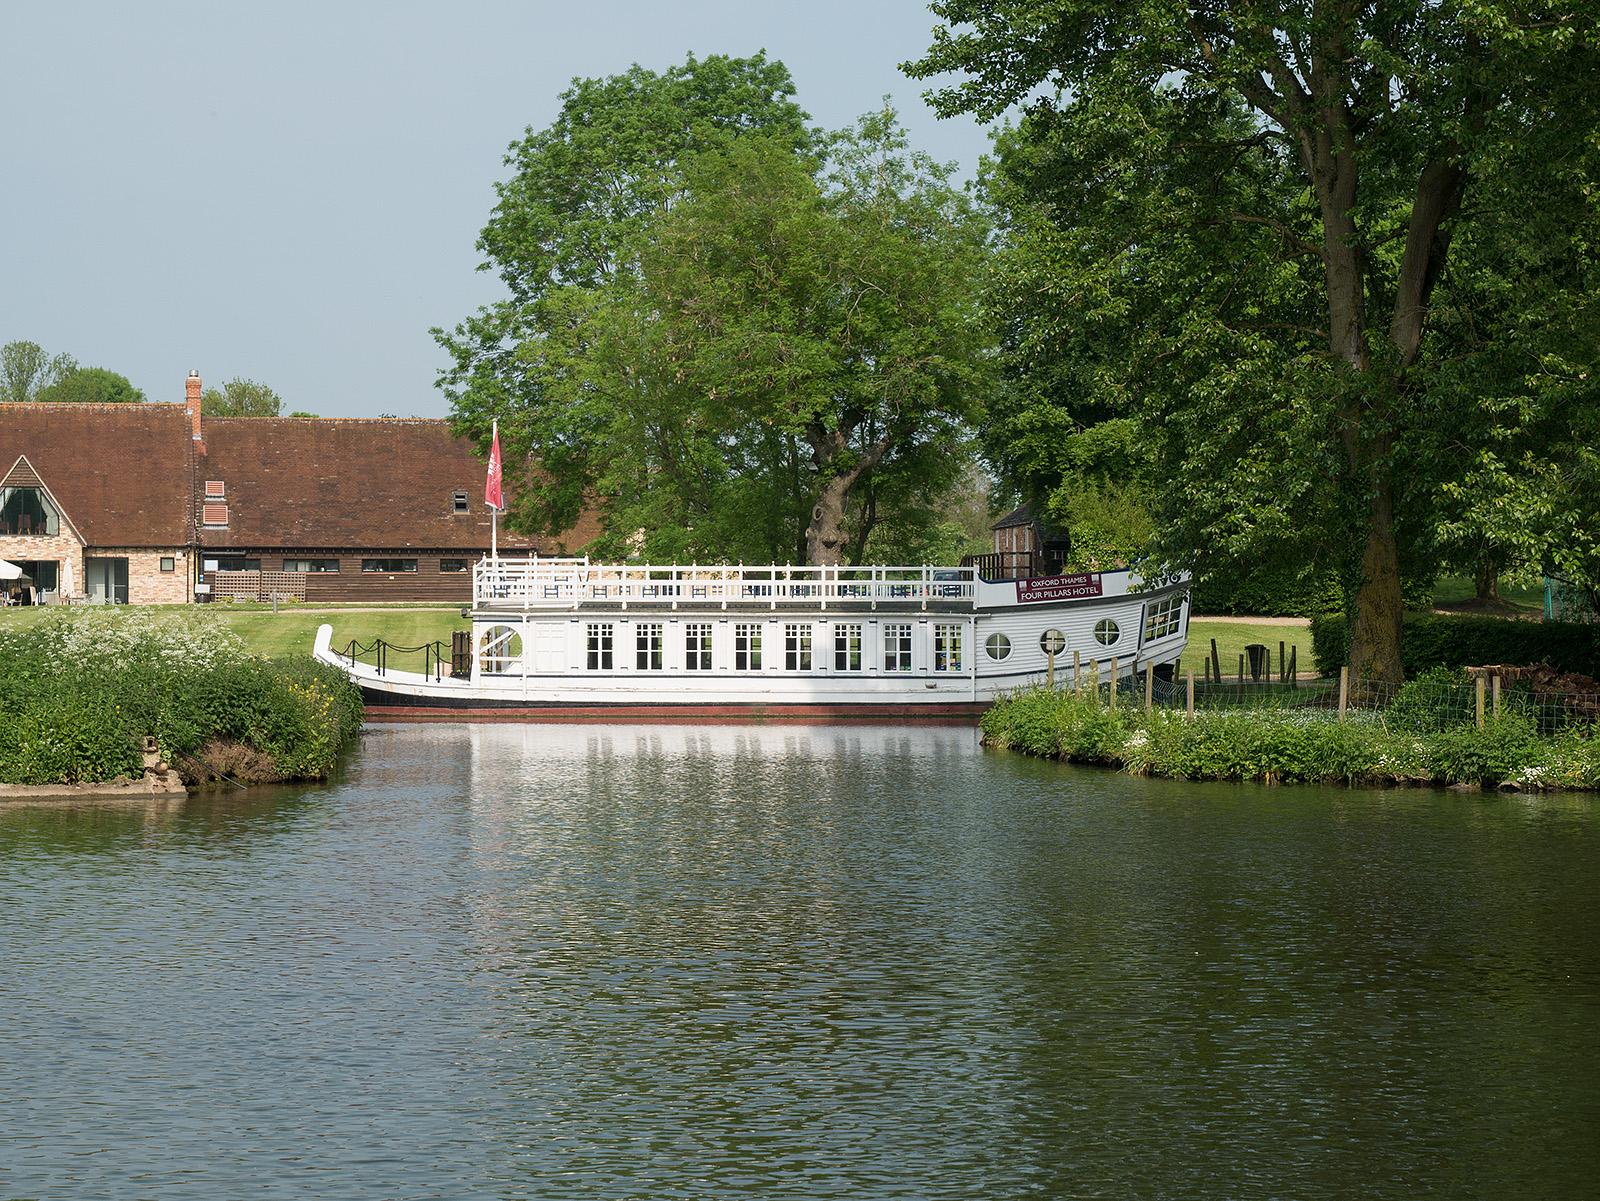 Barge at Four Pillars hotel